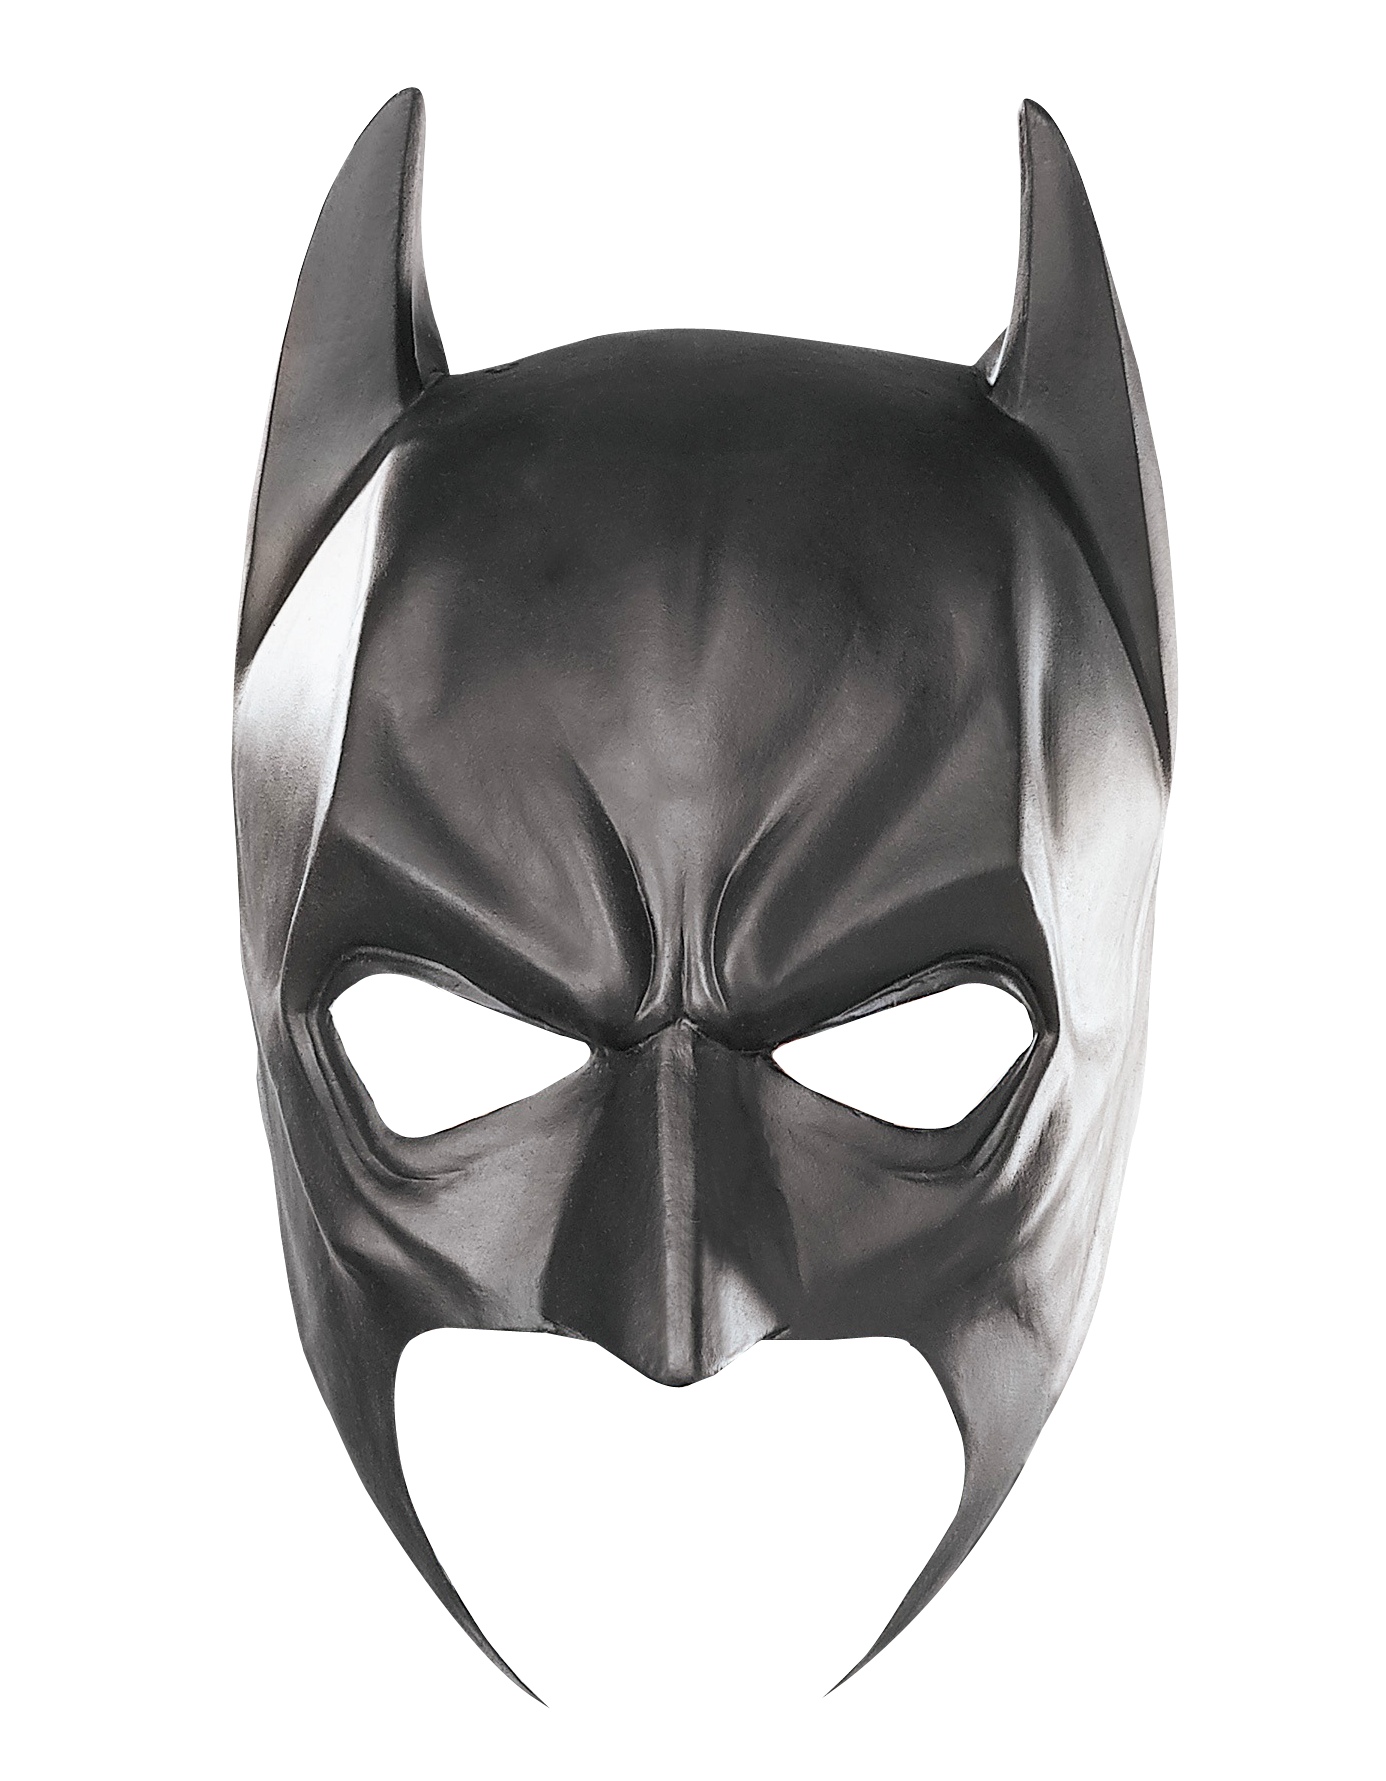 Batman Mask PNG Image